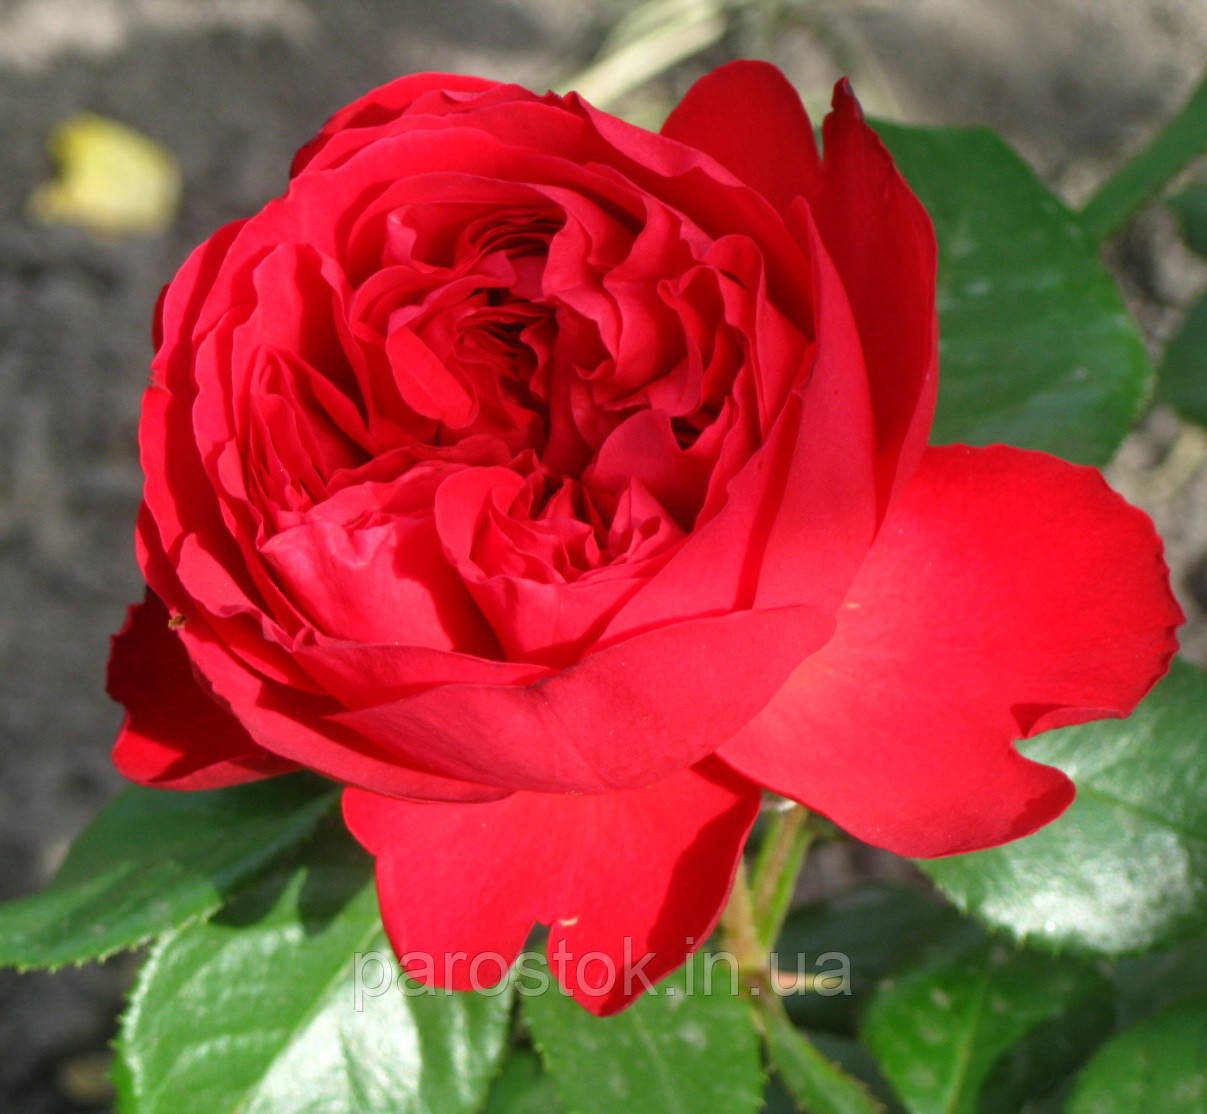 Розы саженцы Алан Сушон. Чайно-гибридная роза